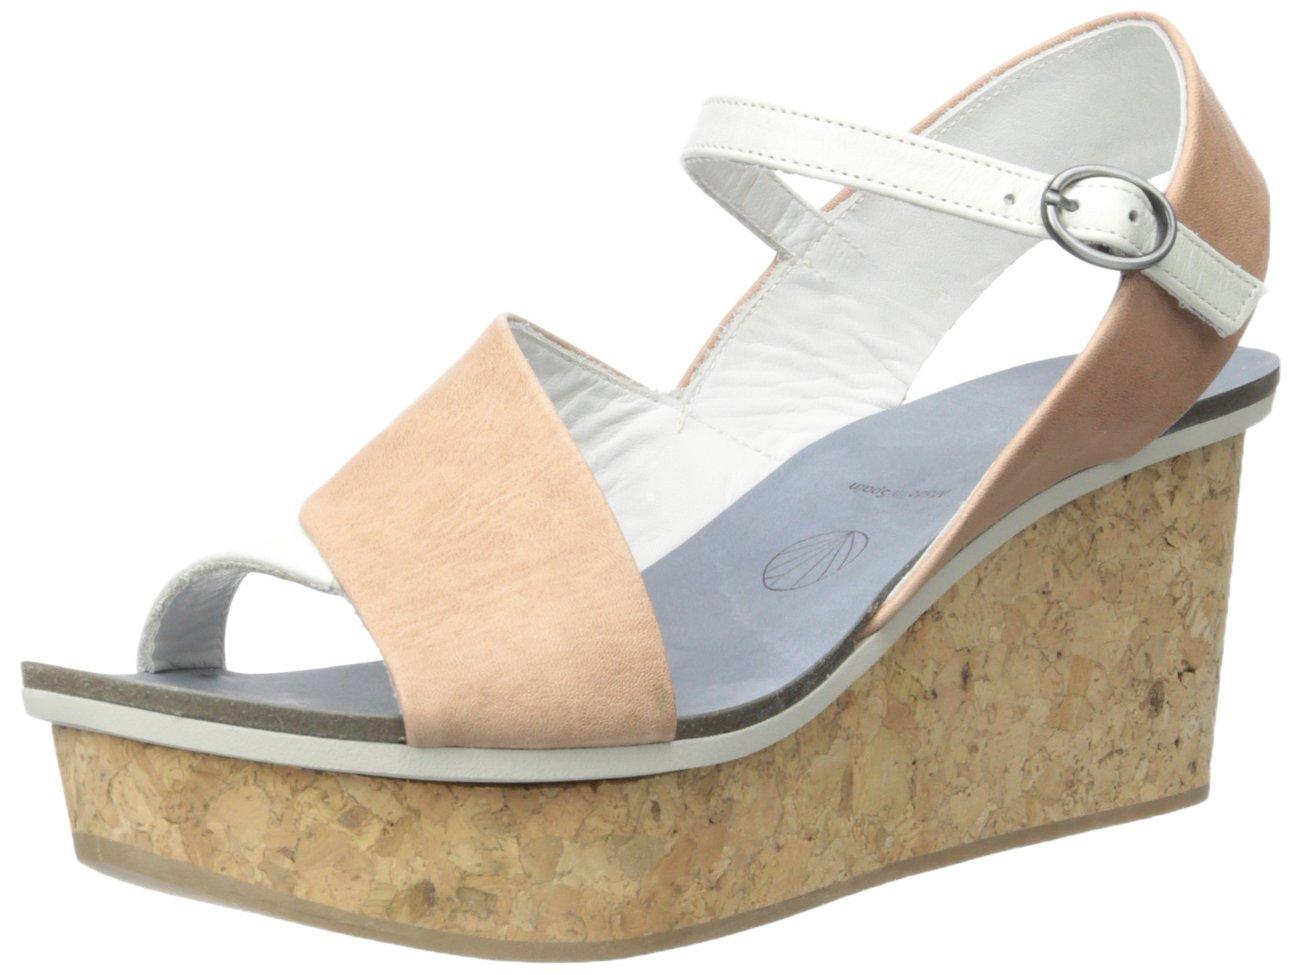 Coclico Women's Mallow Wedge Sandal B019I8RLC4 38 EU/7.5-8 M US|Country Salobrena/Ball Cloud/W Naturel